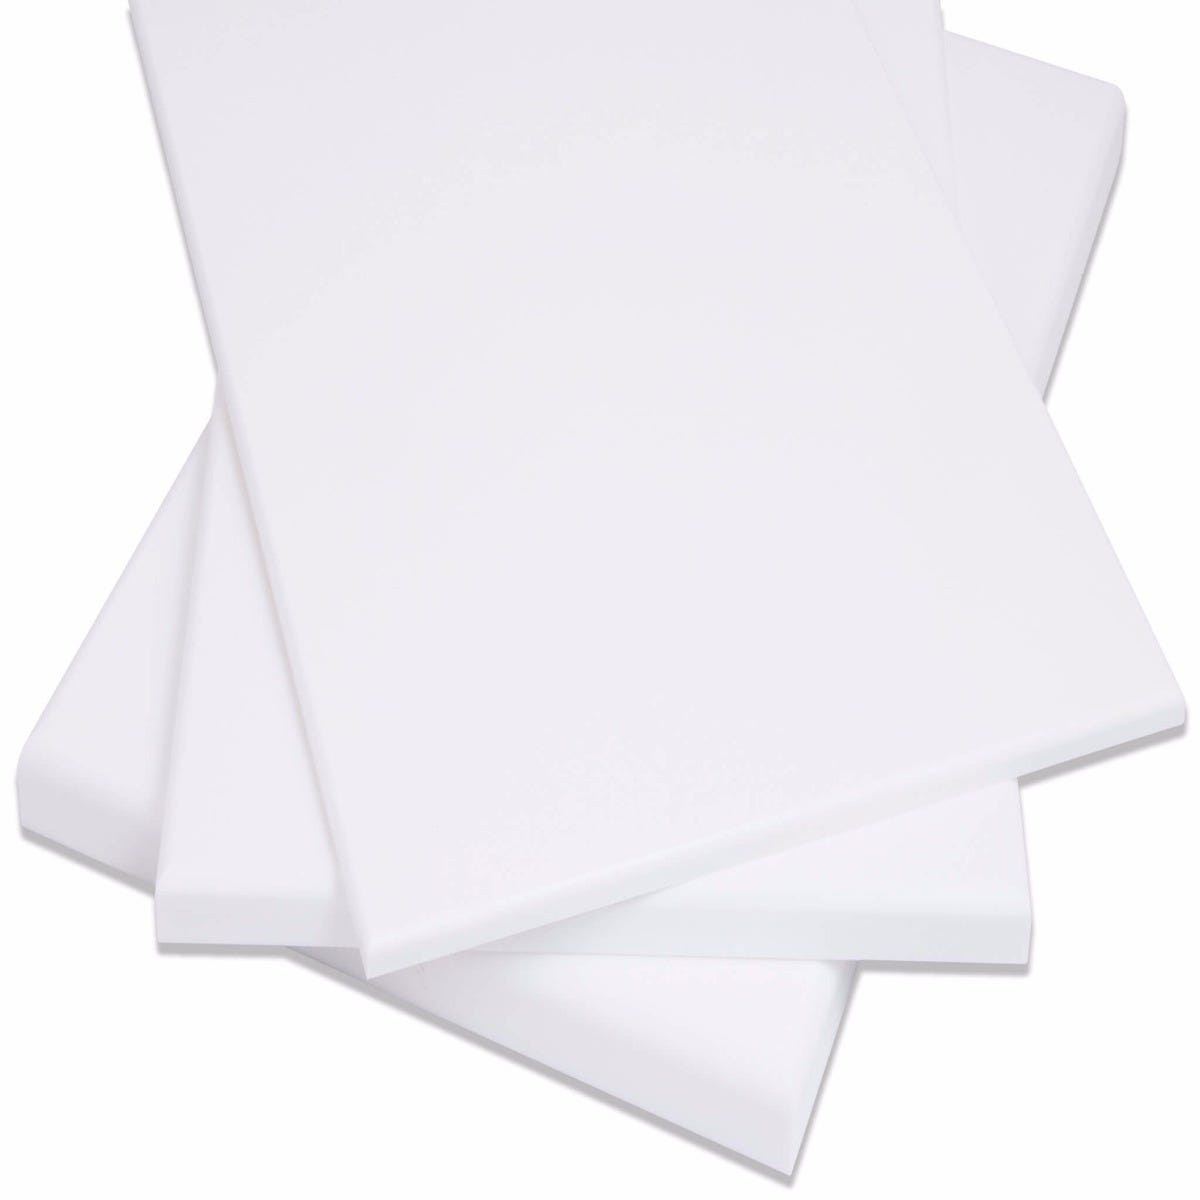 marine board marine plastic plastic sheet material marine